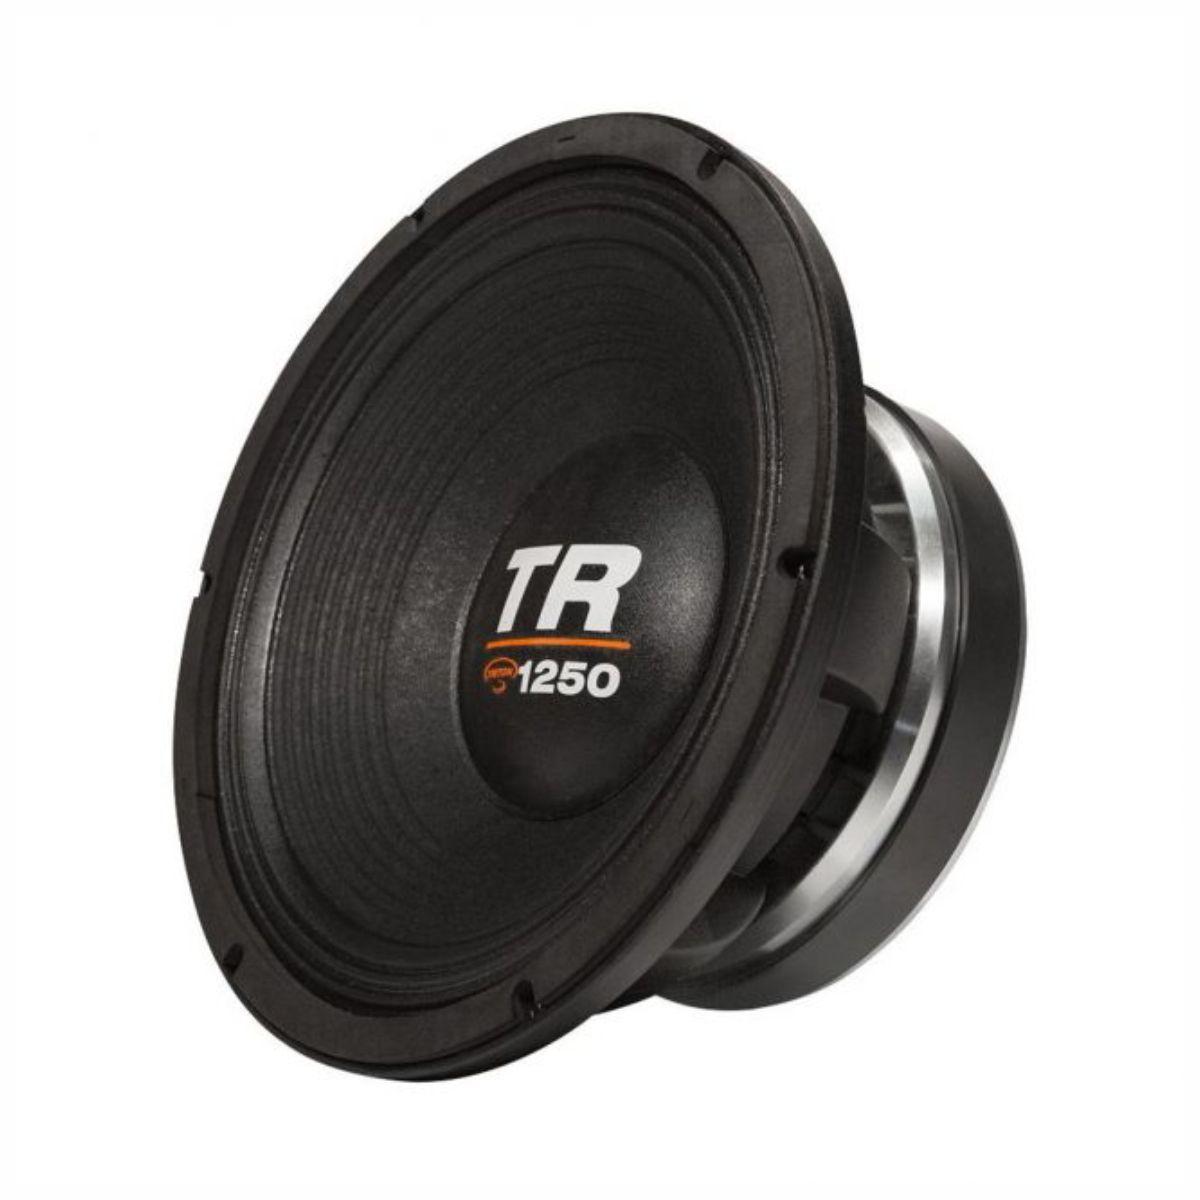 "Alto Falante Woofer Triton 12"" TR 1250 1250W Rms 4 Ohms"